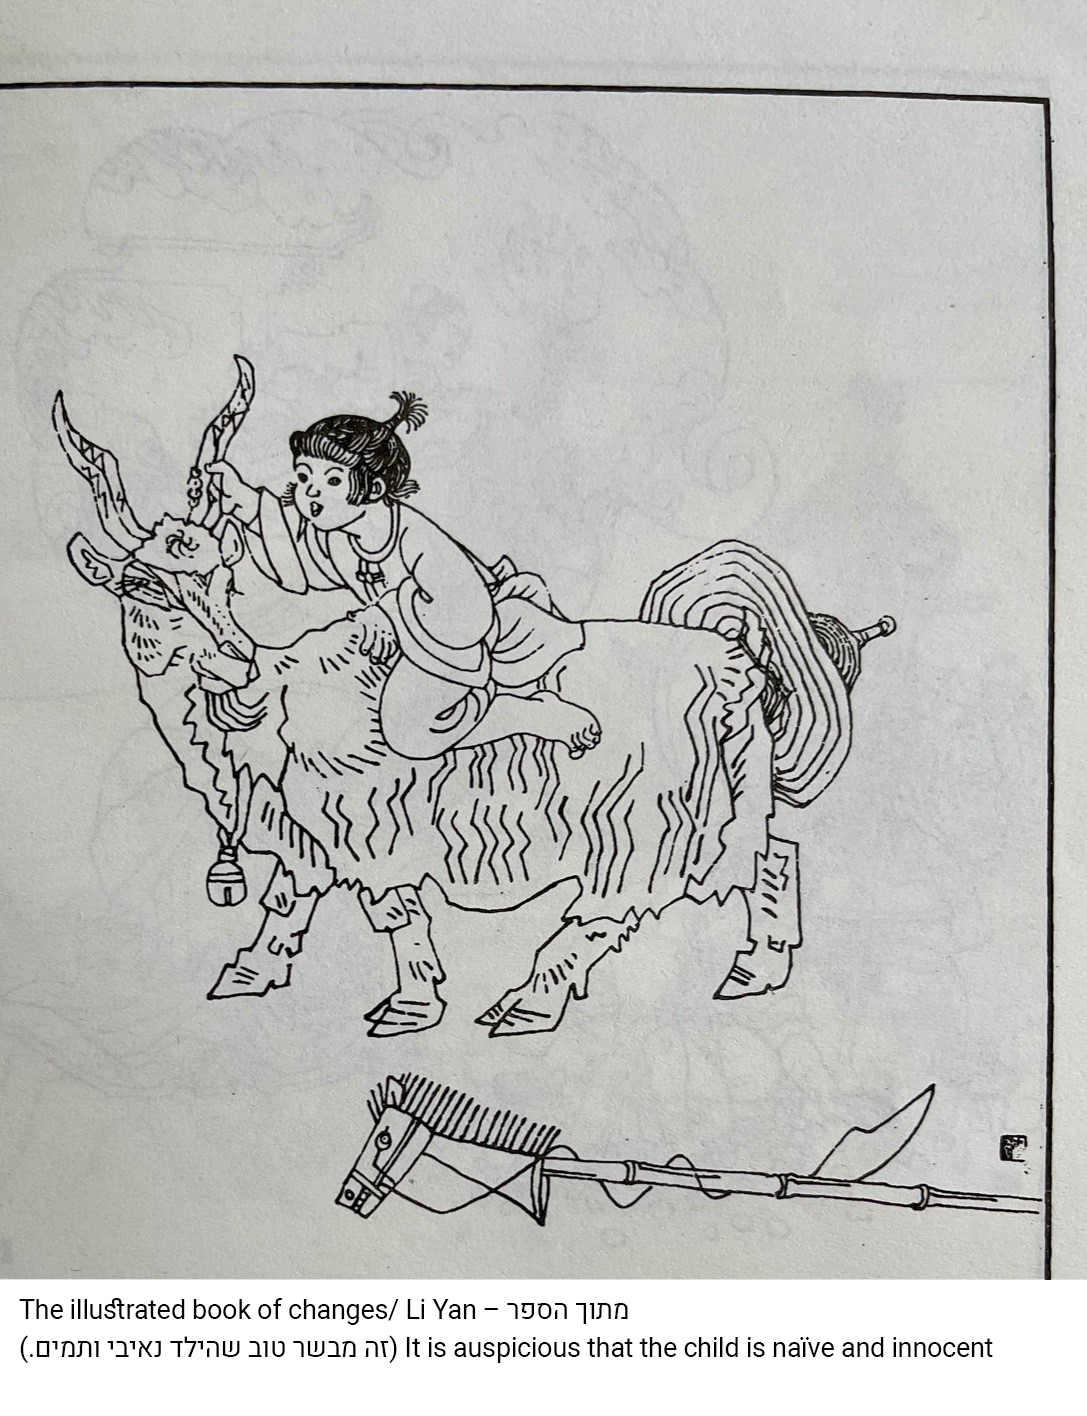 "חפצים ""A culture is not a set of beliefs, it's a set of actions."" –Bushido<br><br>תרבות איננה אוסף אמונות, אלא סט פעולות."